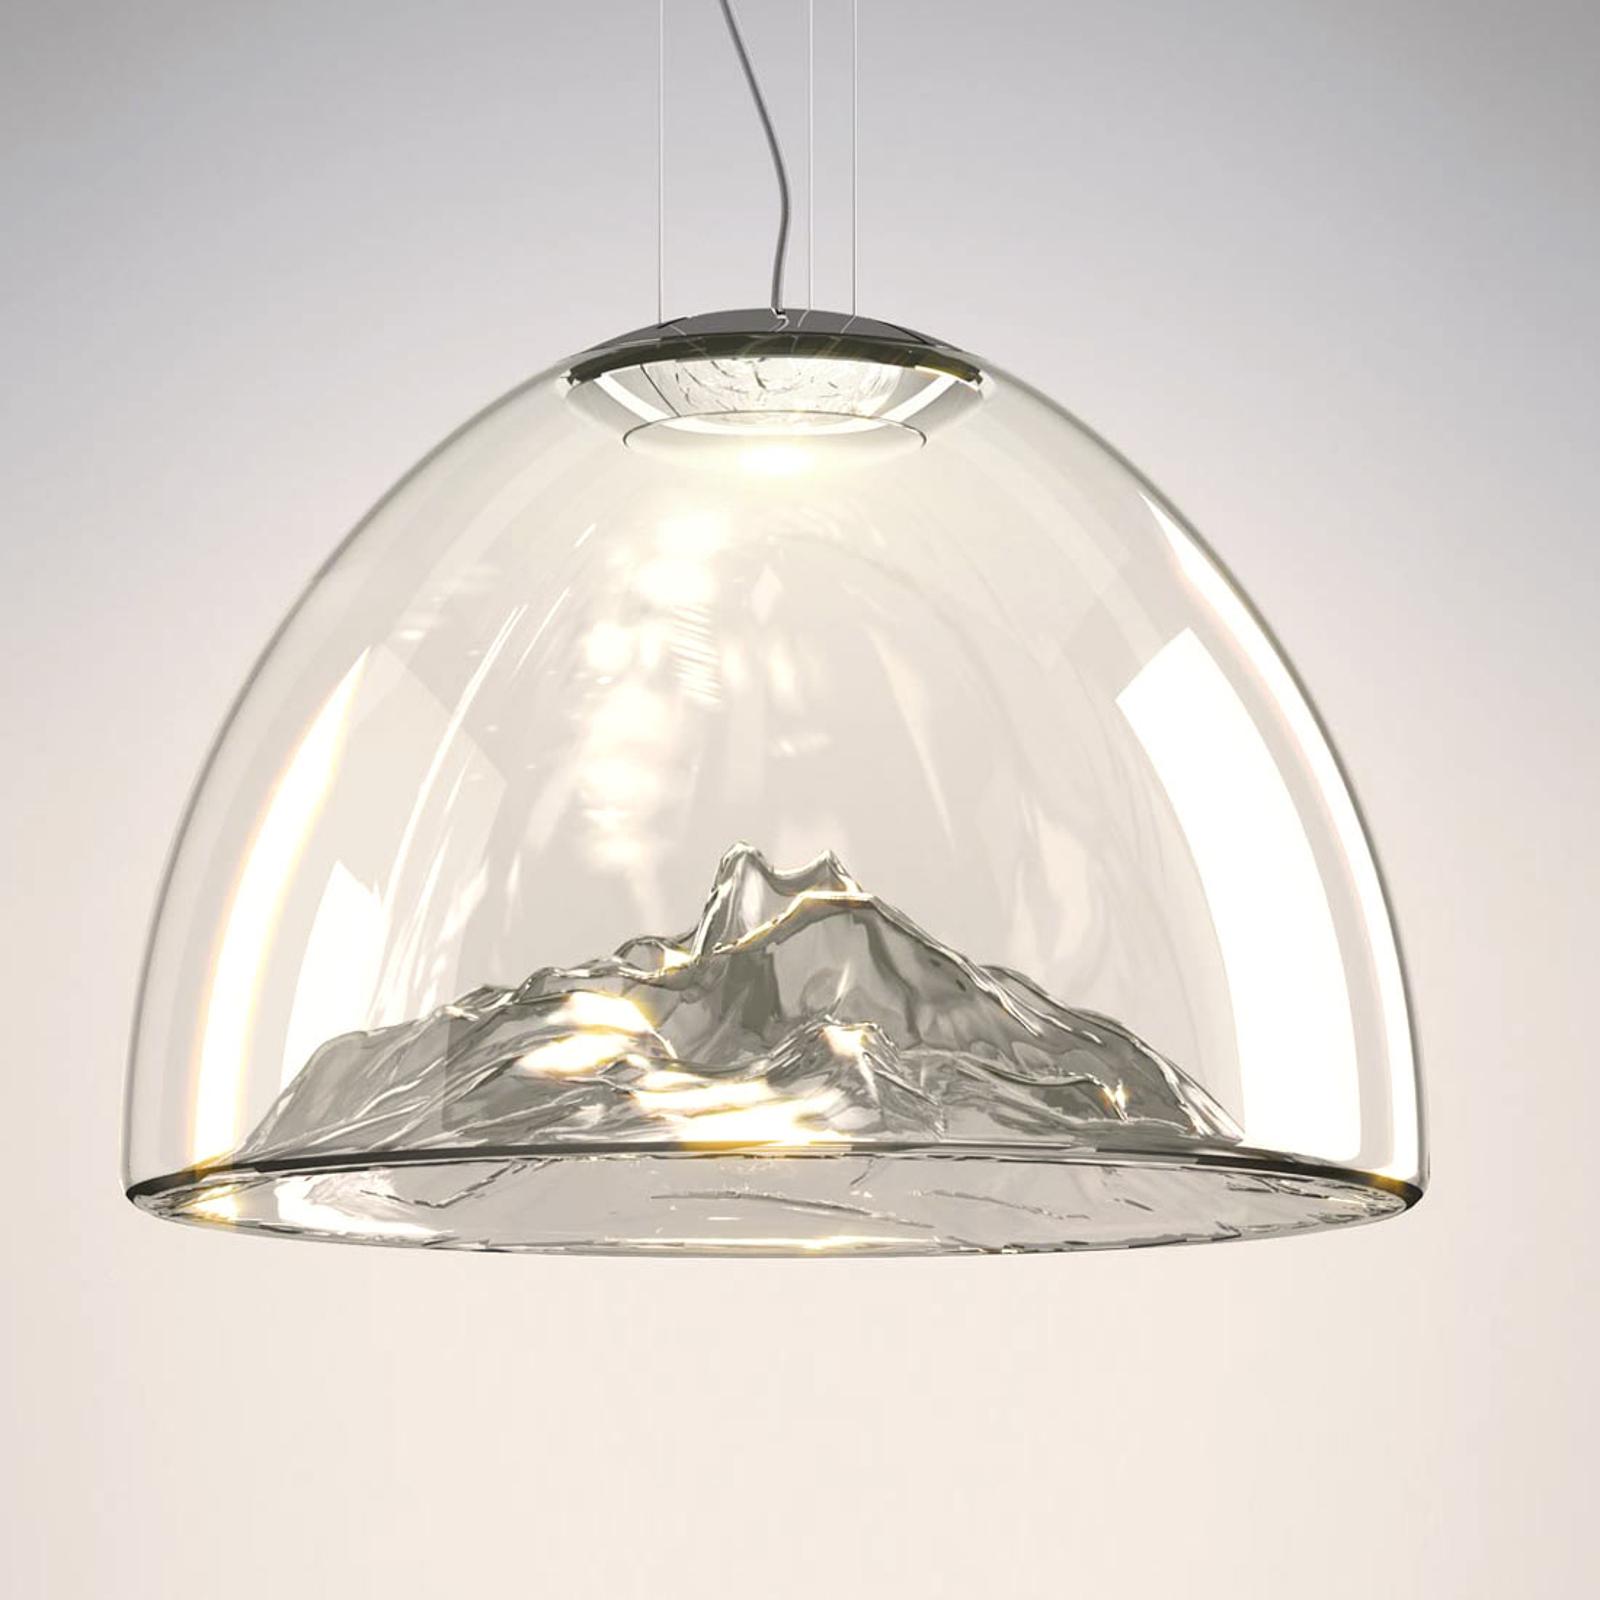 Axolight Mountain View - LED-pendellampe grå-krom